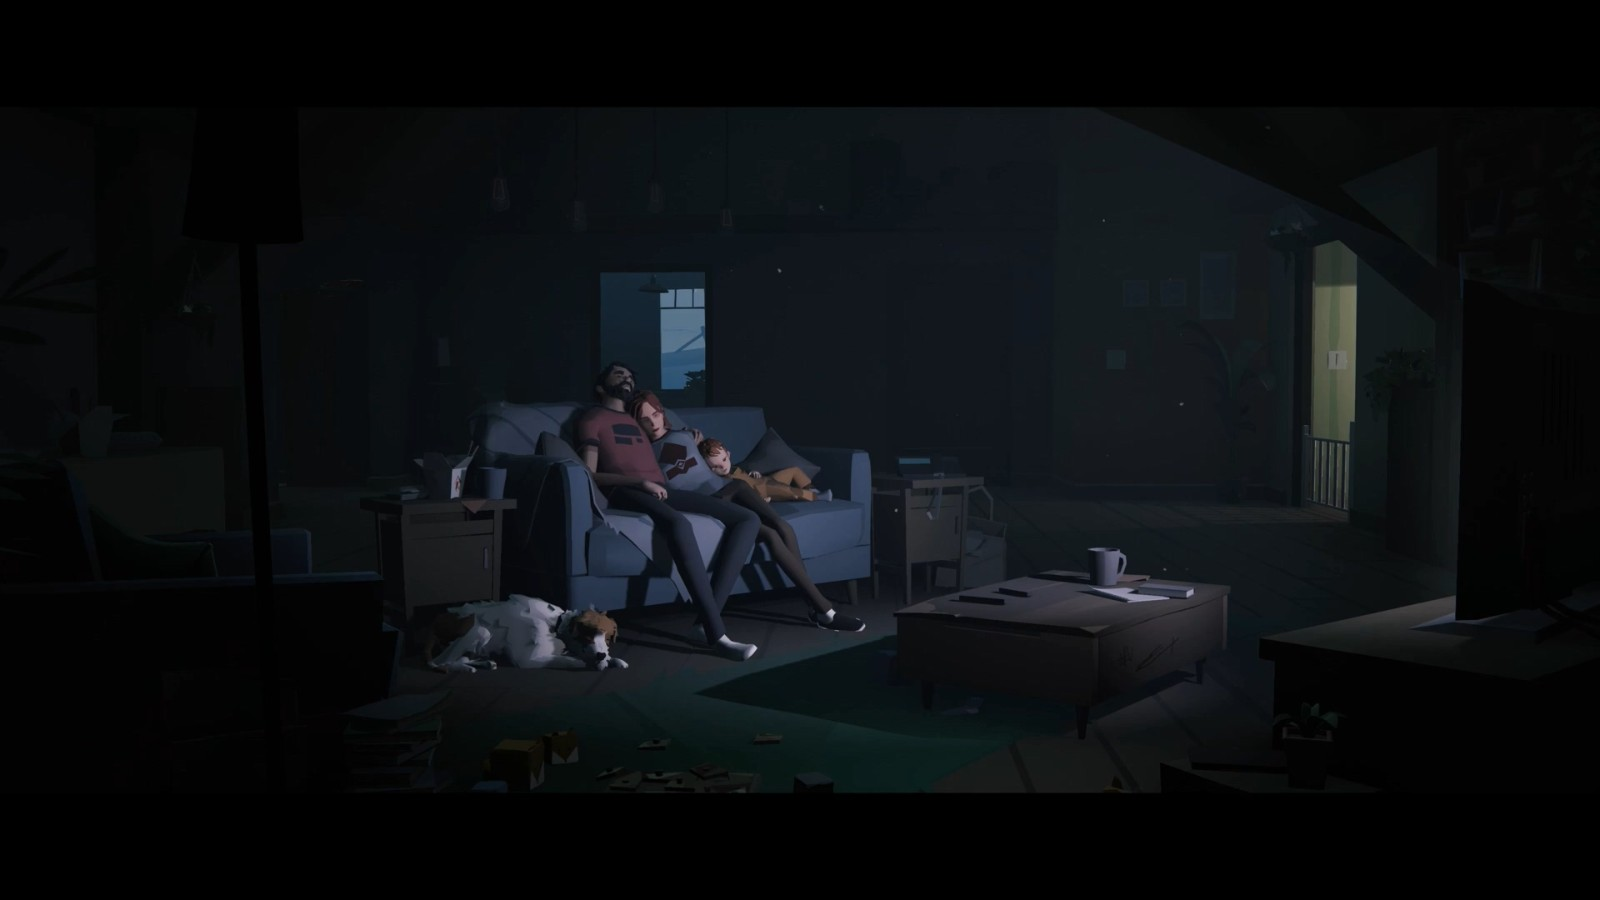 E3:沿袭《地狱边境》风格 《Somerville》2022年发售